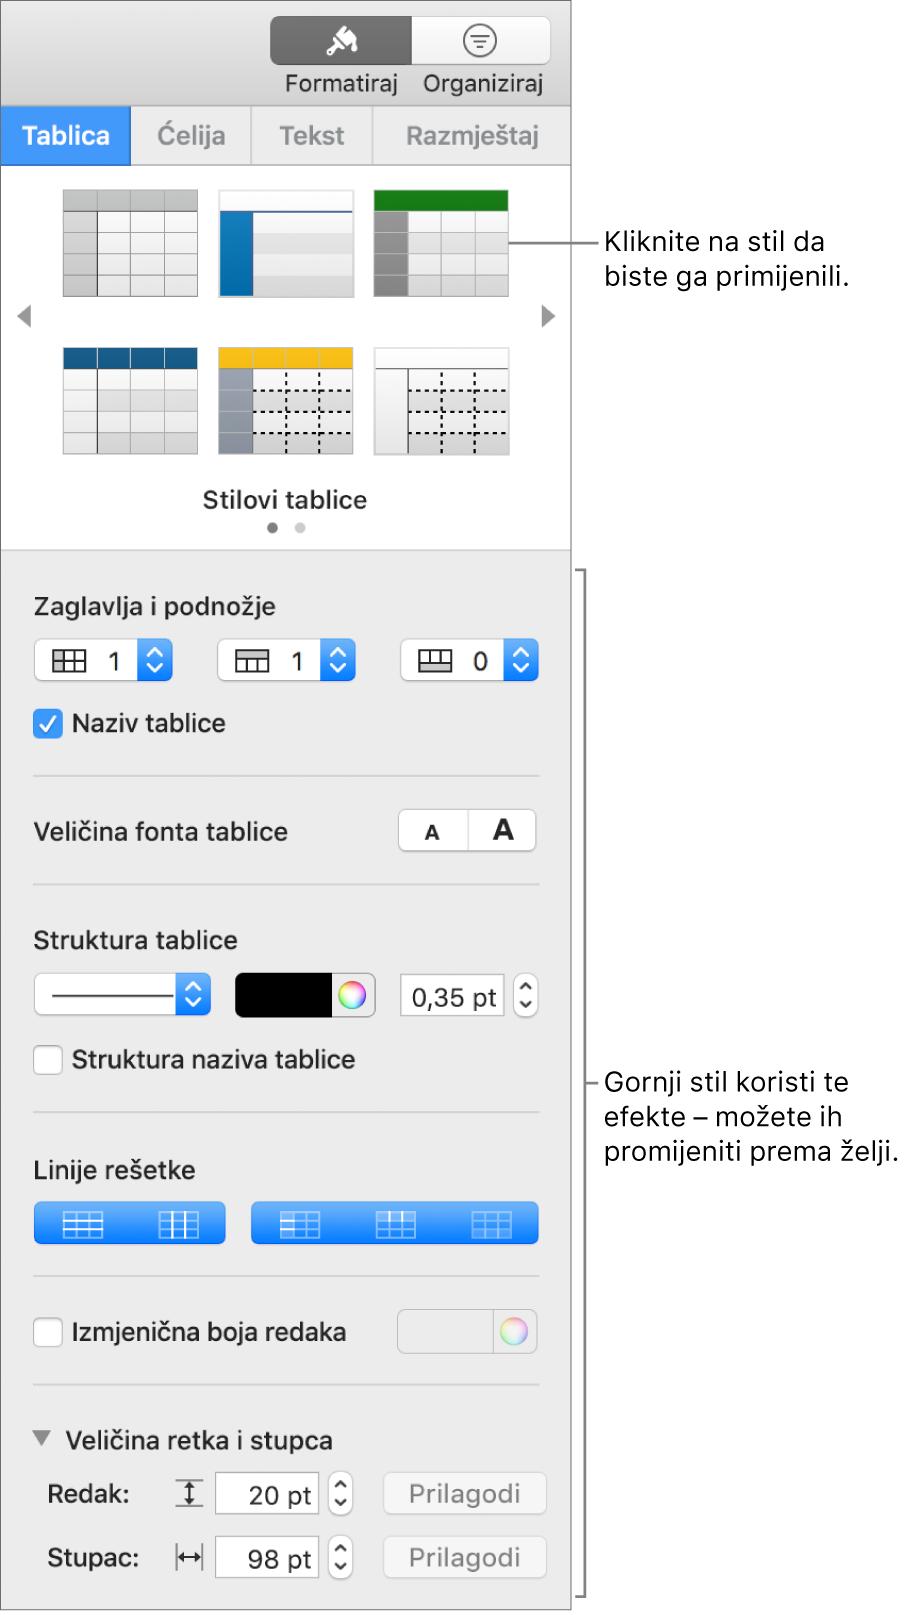 Rubni stupac Formatiraj s prikazom stilova tablica i opcija formatiranja.